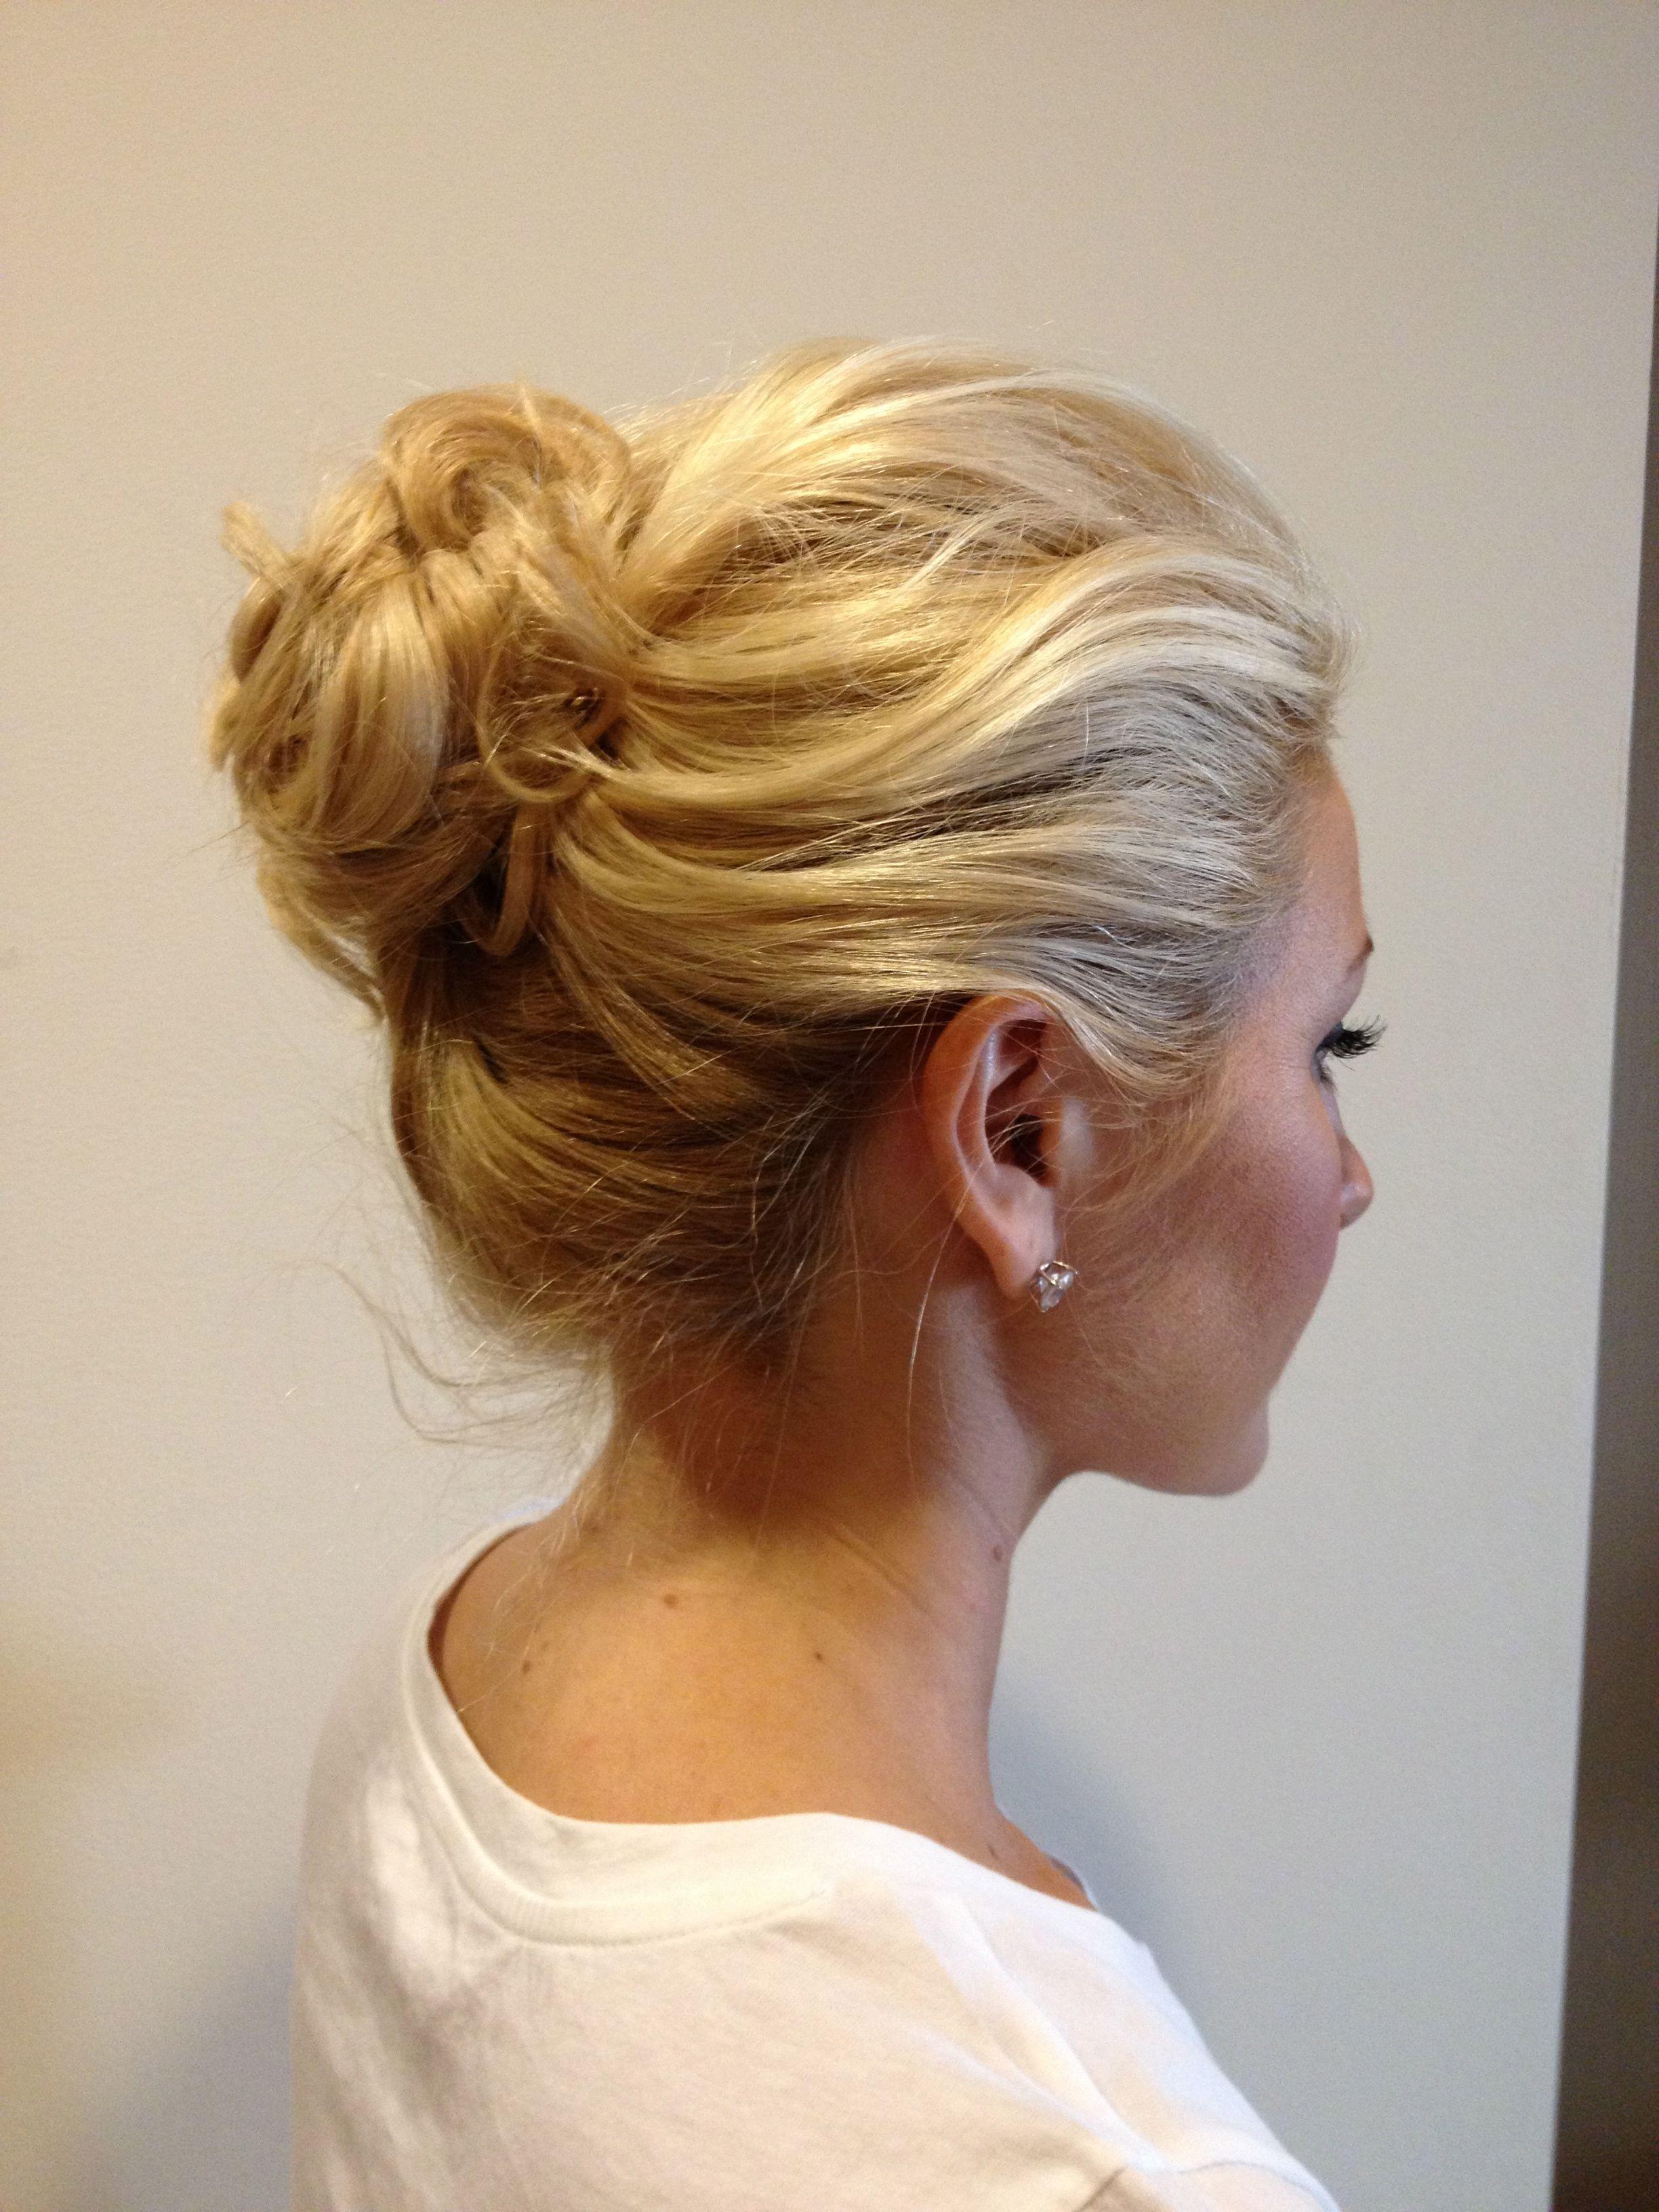 Pretty bun hair updo wedding pinterest bun hair updo and